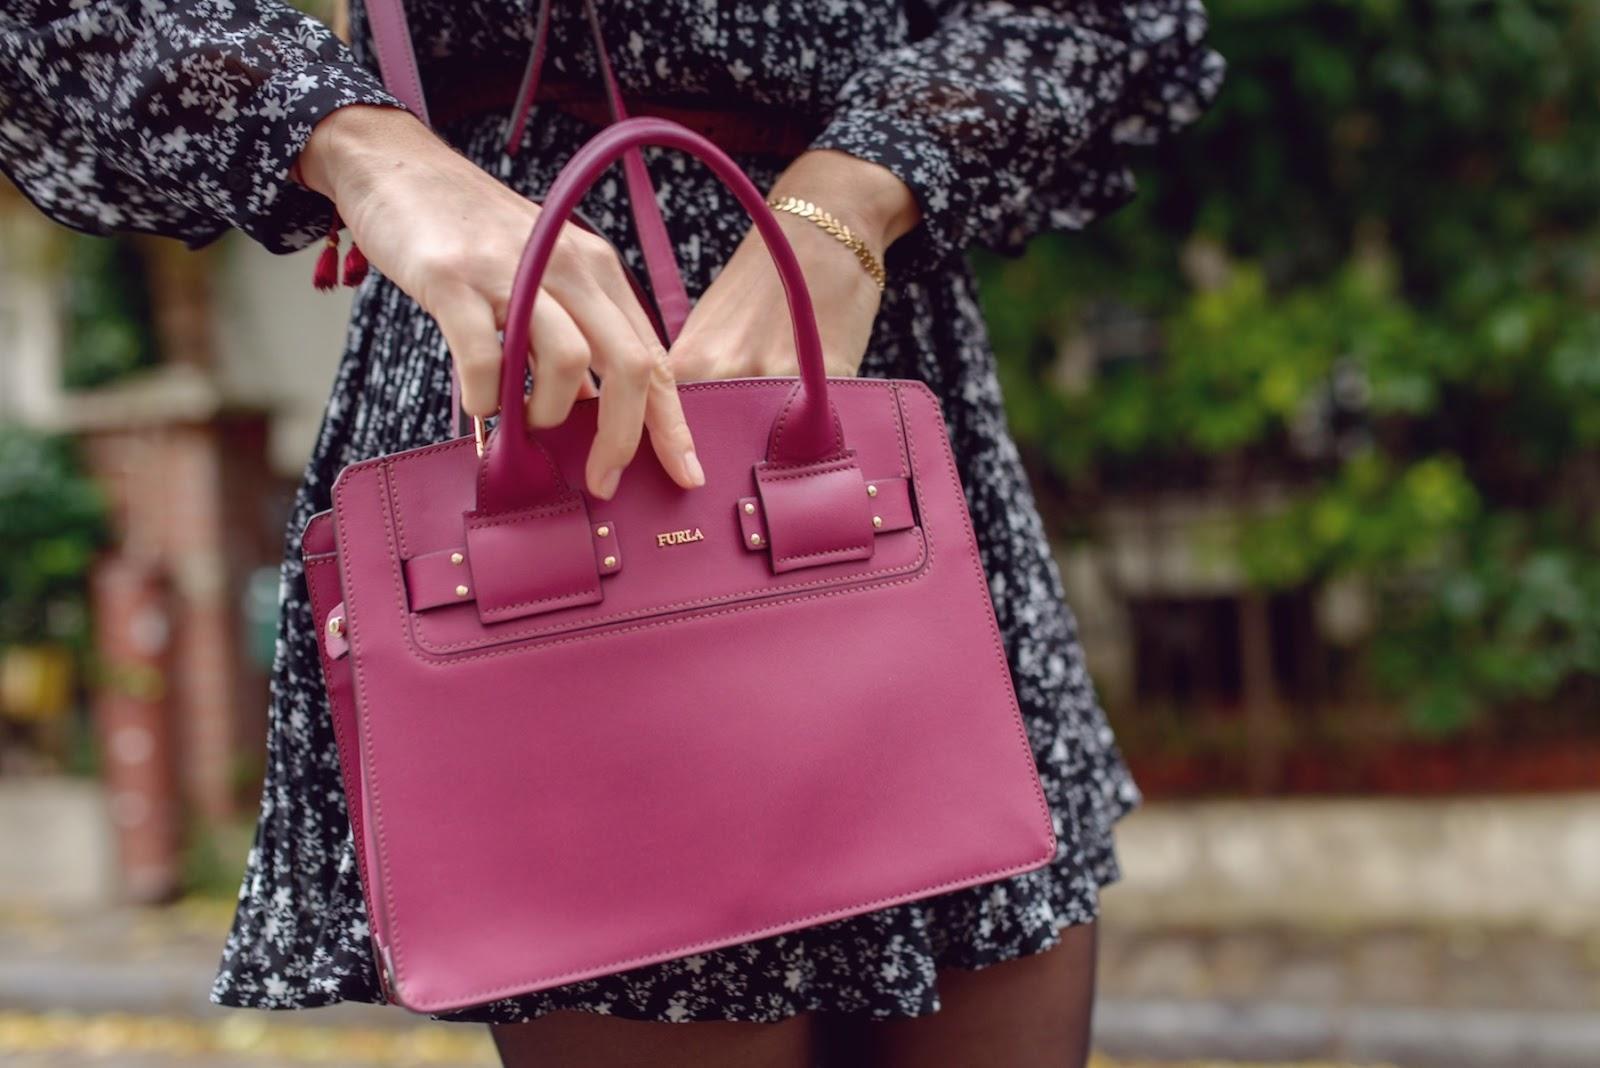 sac furla violet